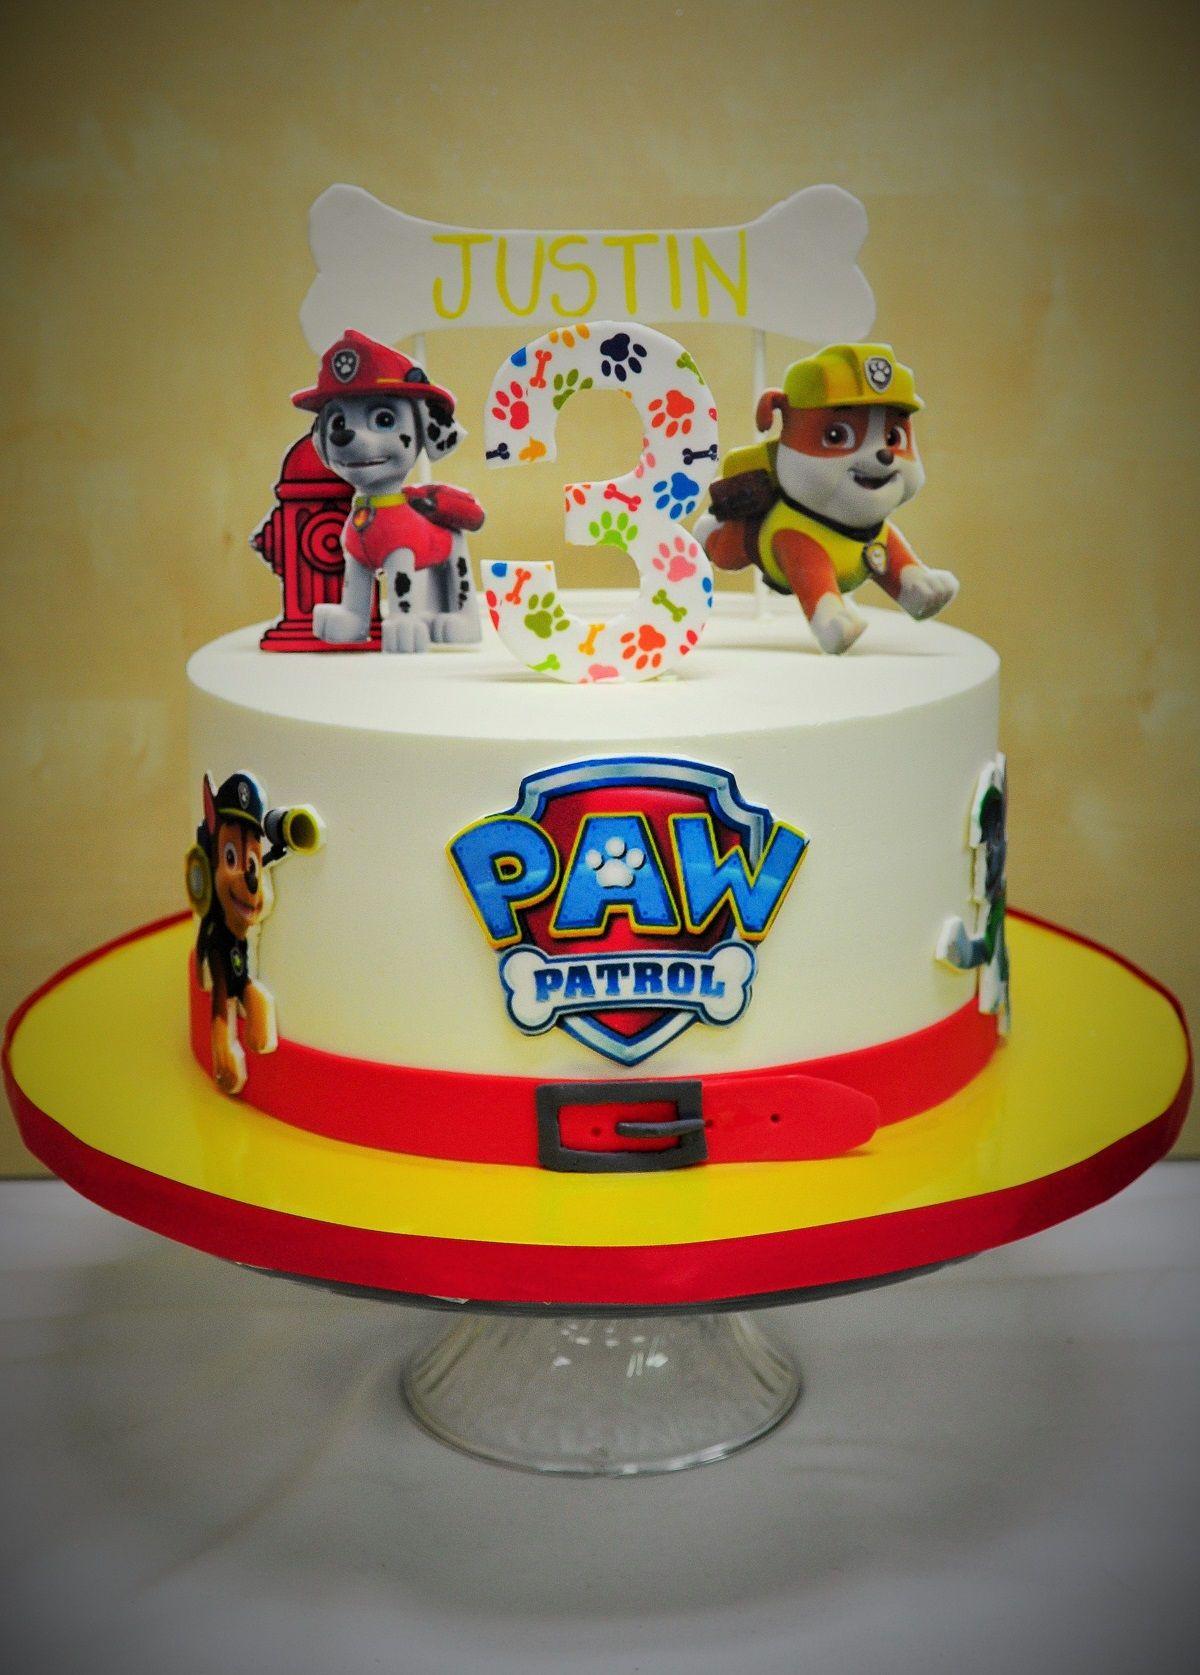 silly paw patrol cake for 3rd birthday  paw patrol cake